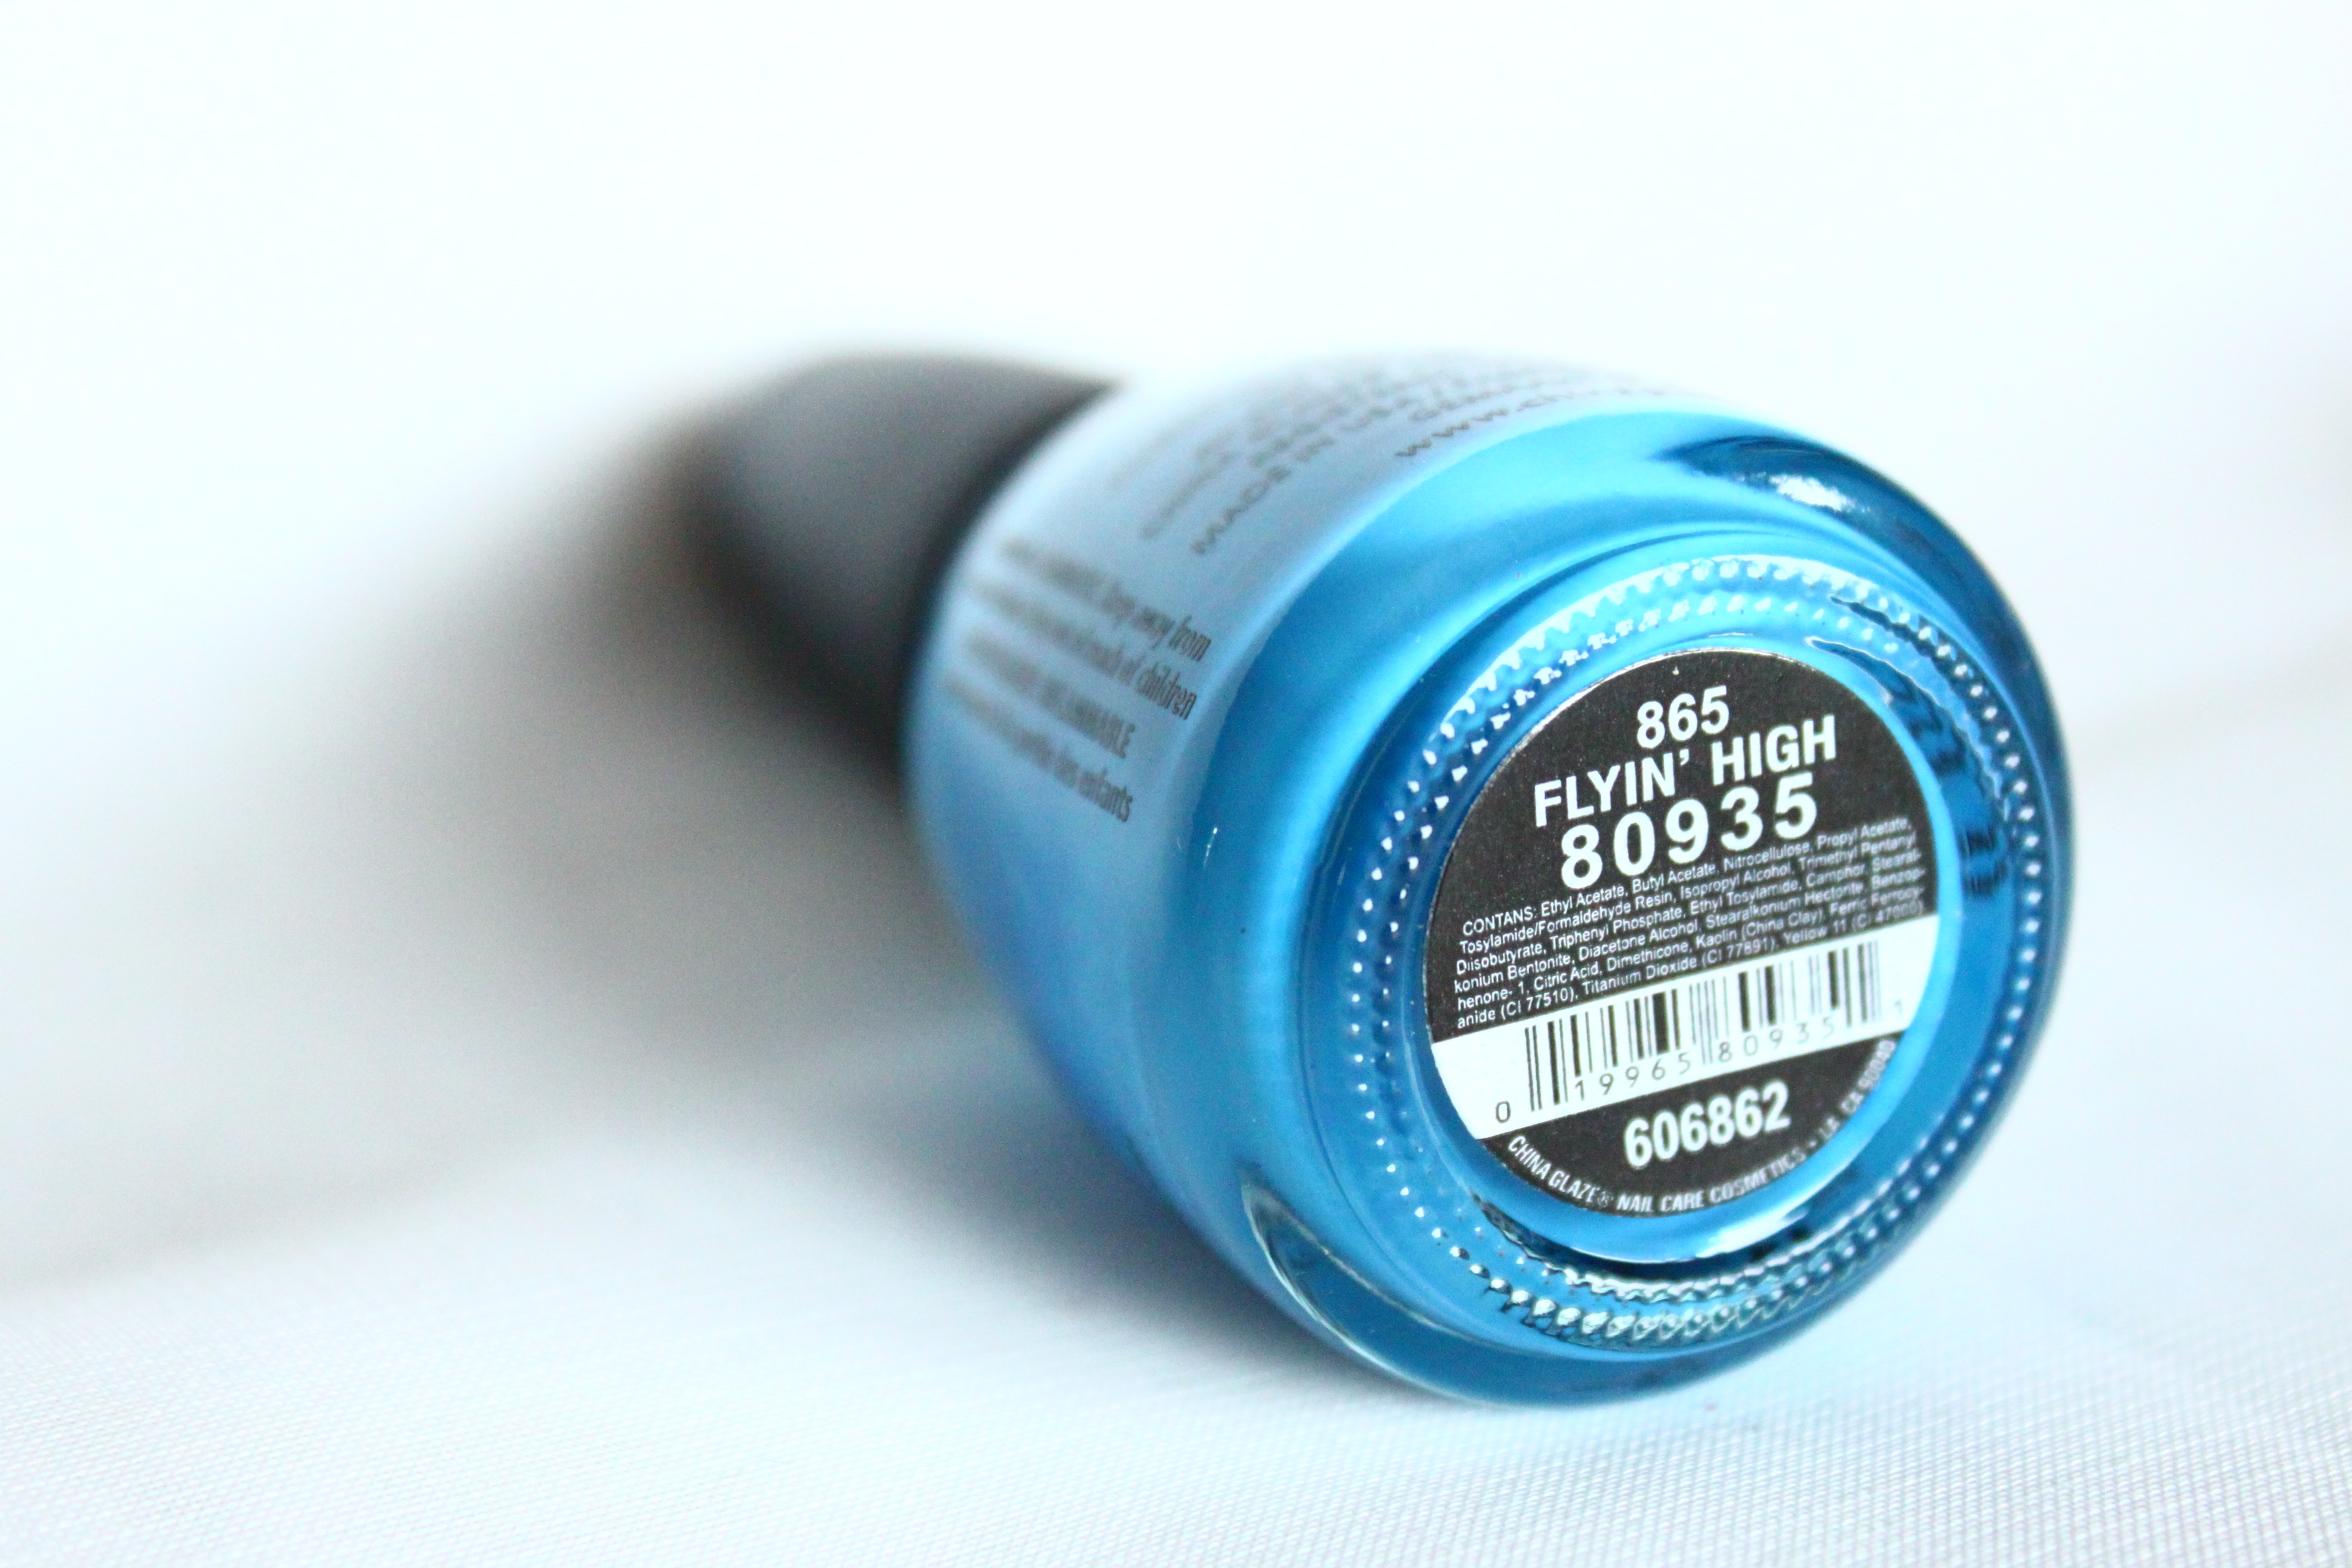 China Glaze Nagellack Nail Lacquer Polish 865 FLYING HIGH Blau blue